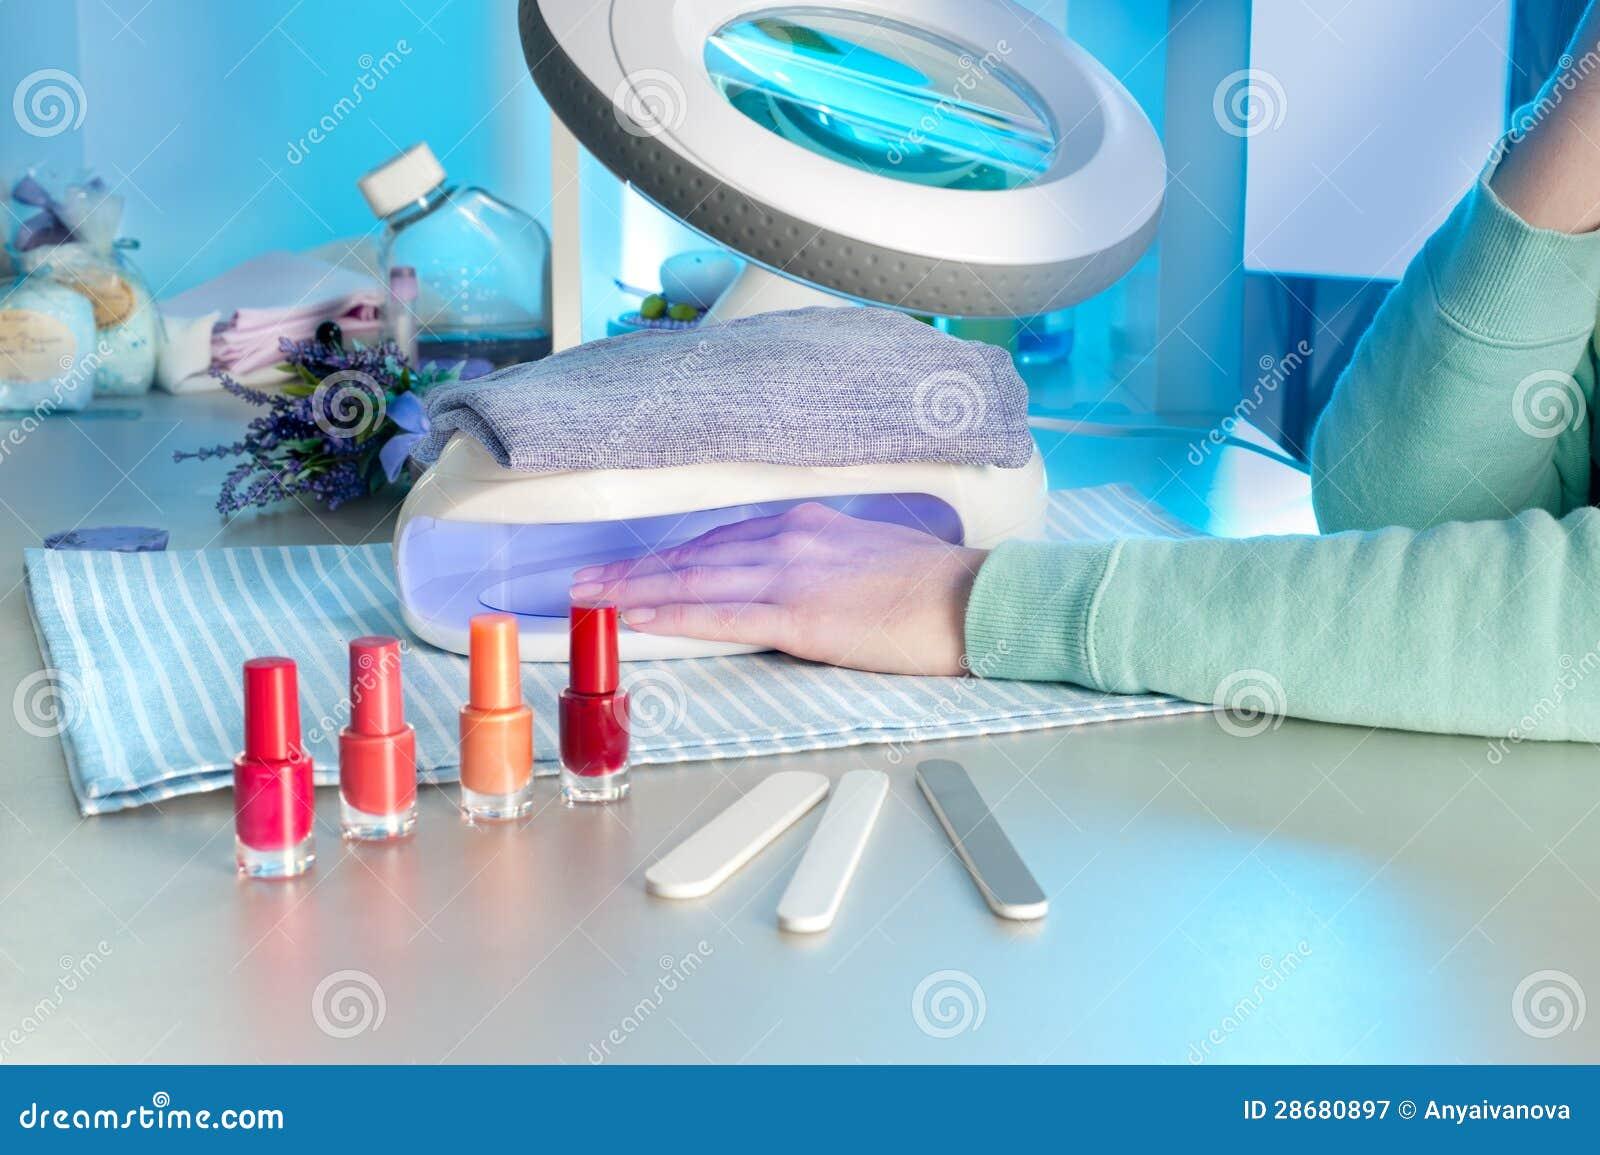 Nail Salon Drying UV Light Machine Stock Image - Image of manicure